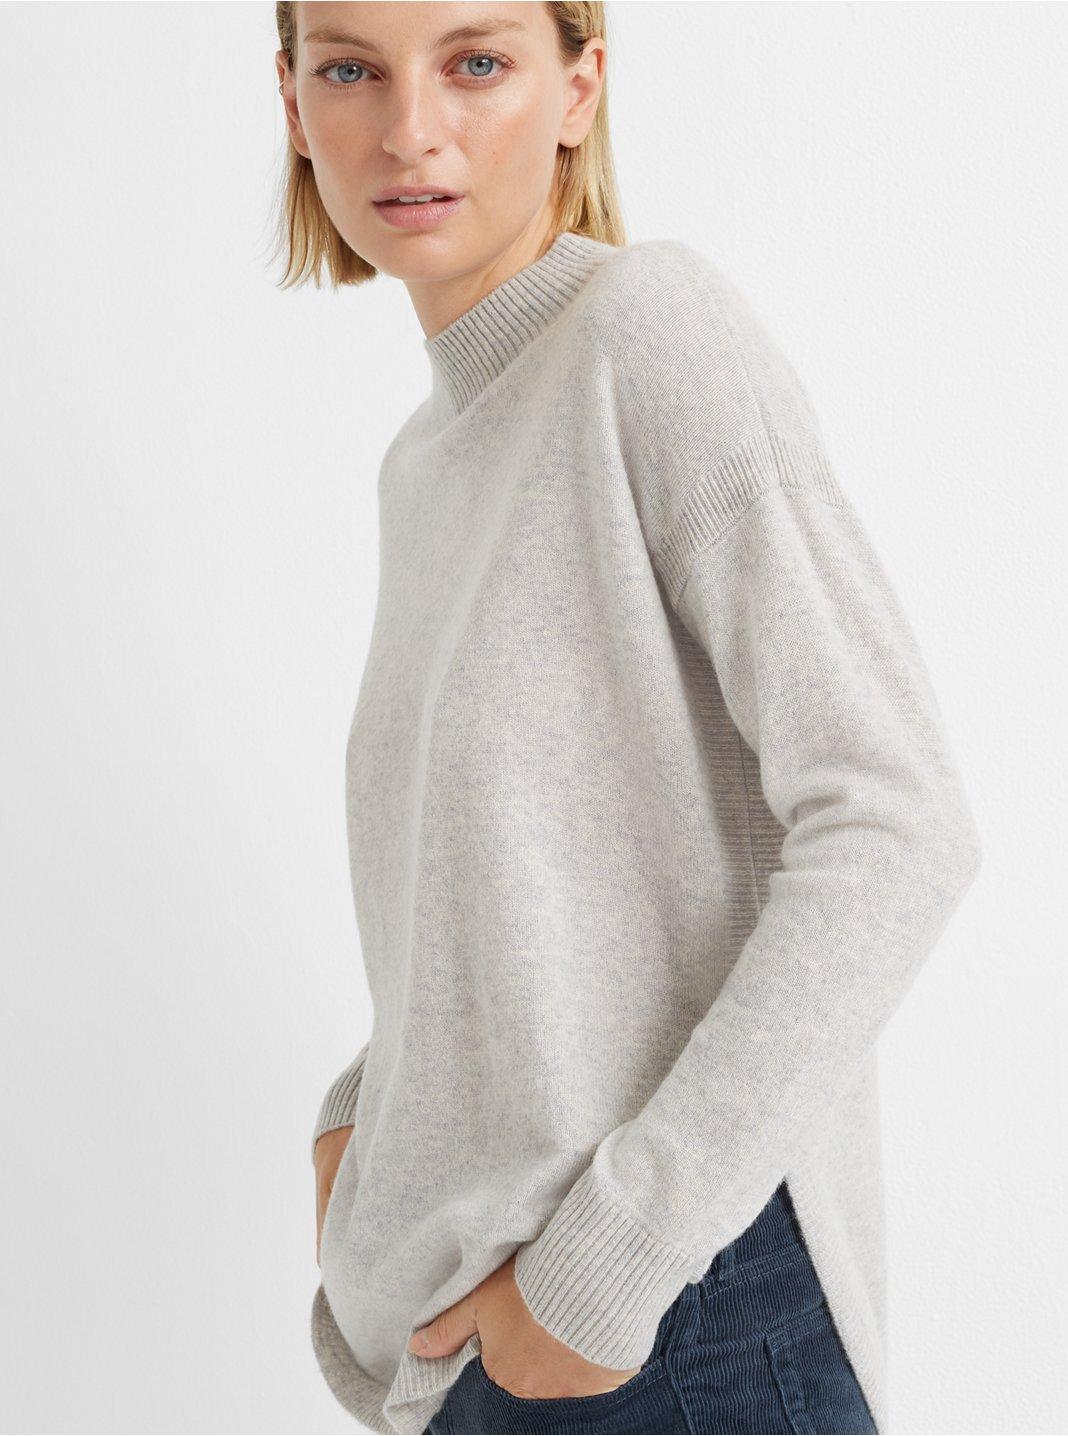 Nalia Cashmere Sweater